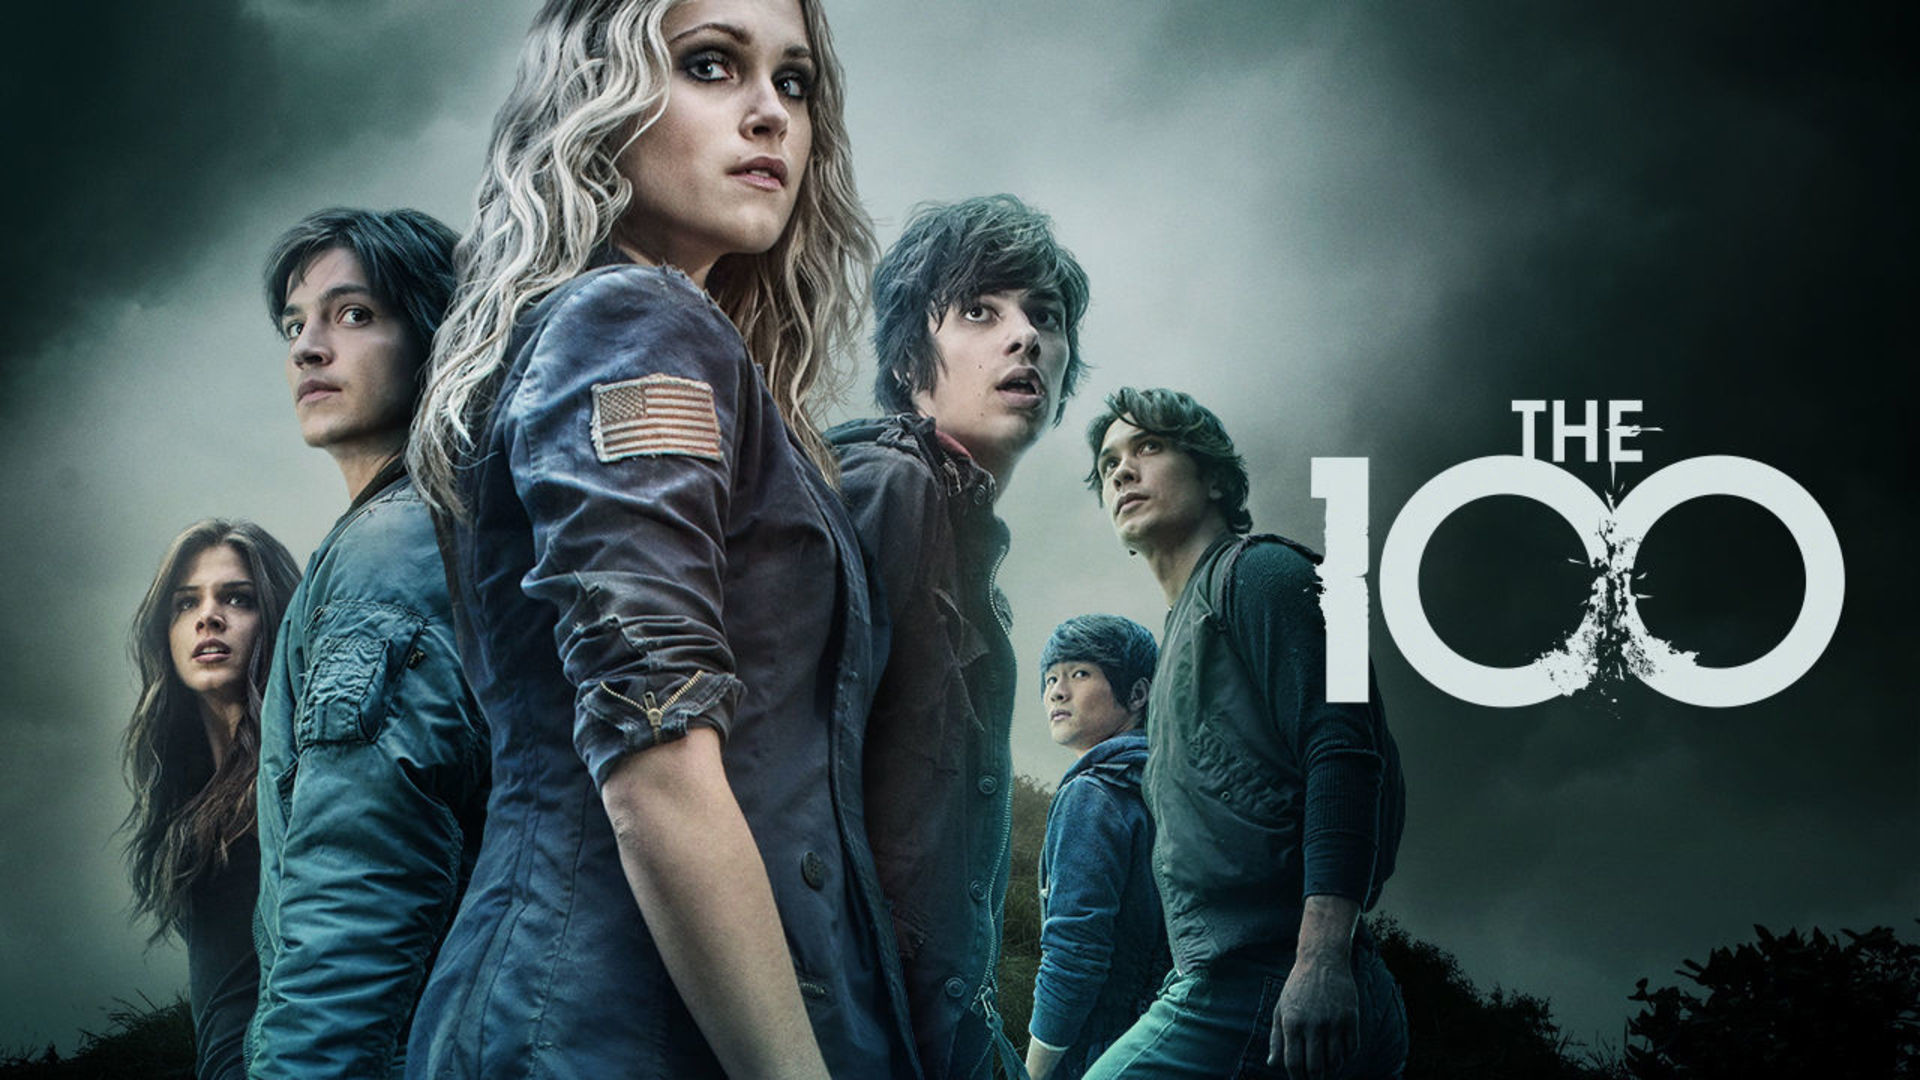 The CW Renews The 100 for Season 5